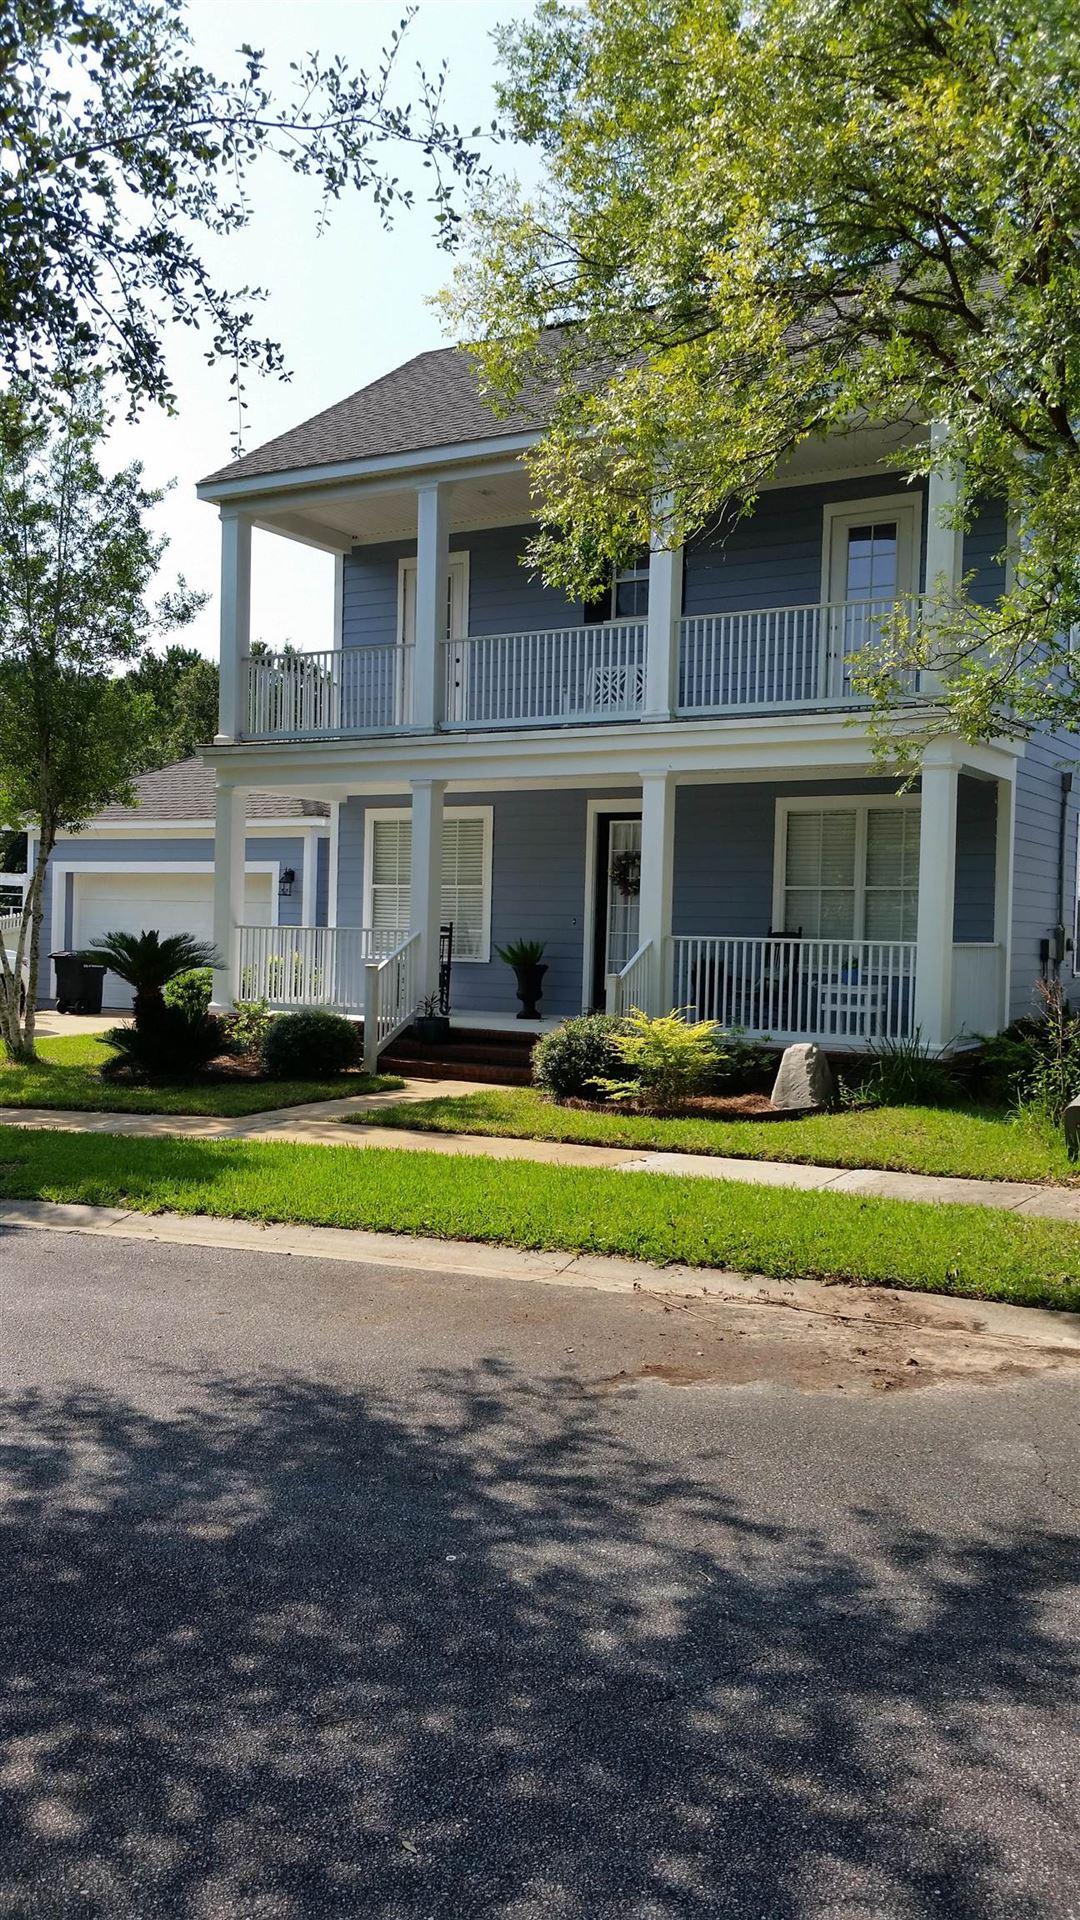 3773 Overlook Drive, Tallahassee, FL 32311 - MLS#: 337589